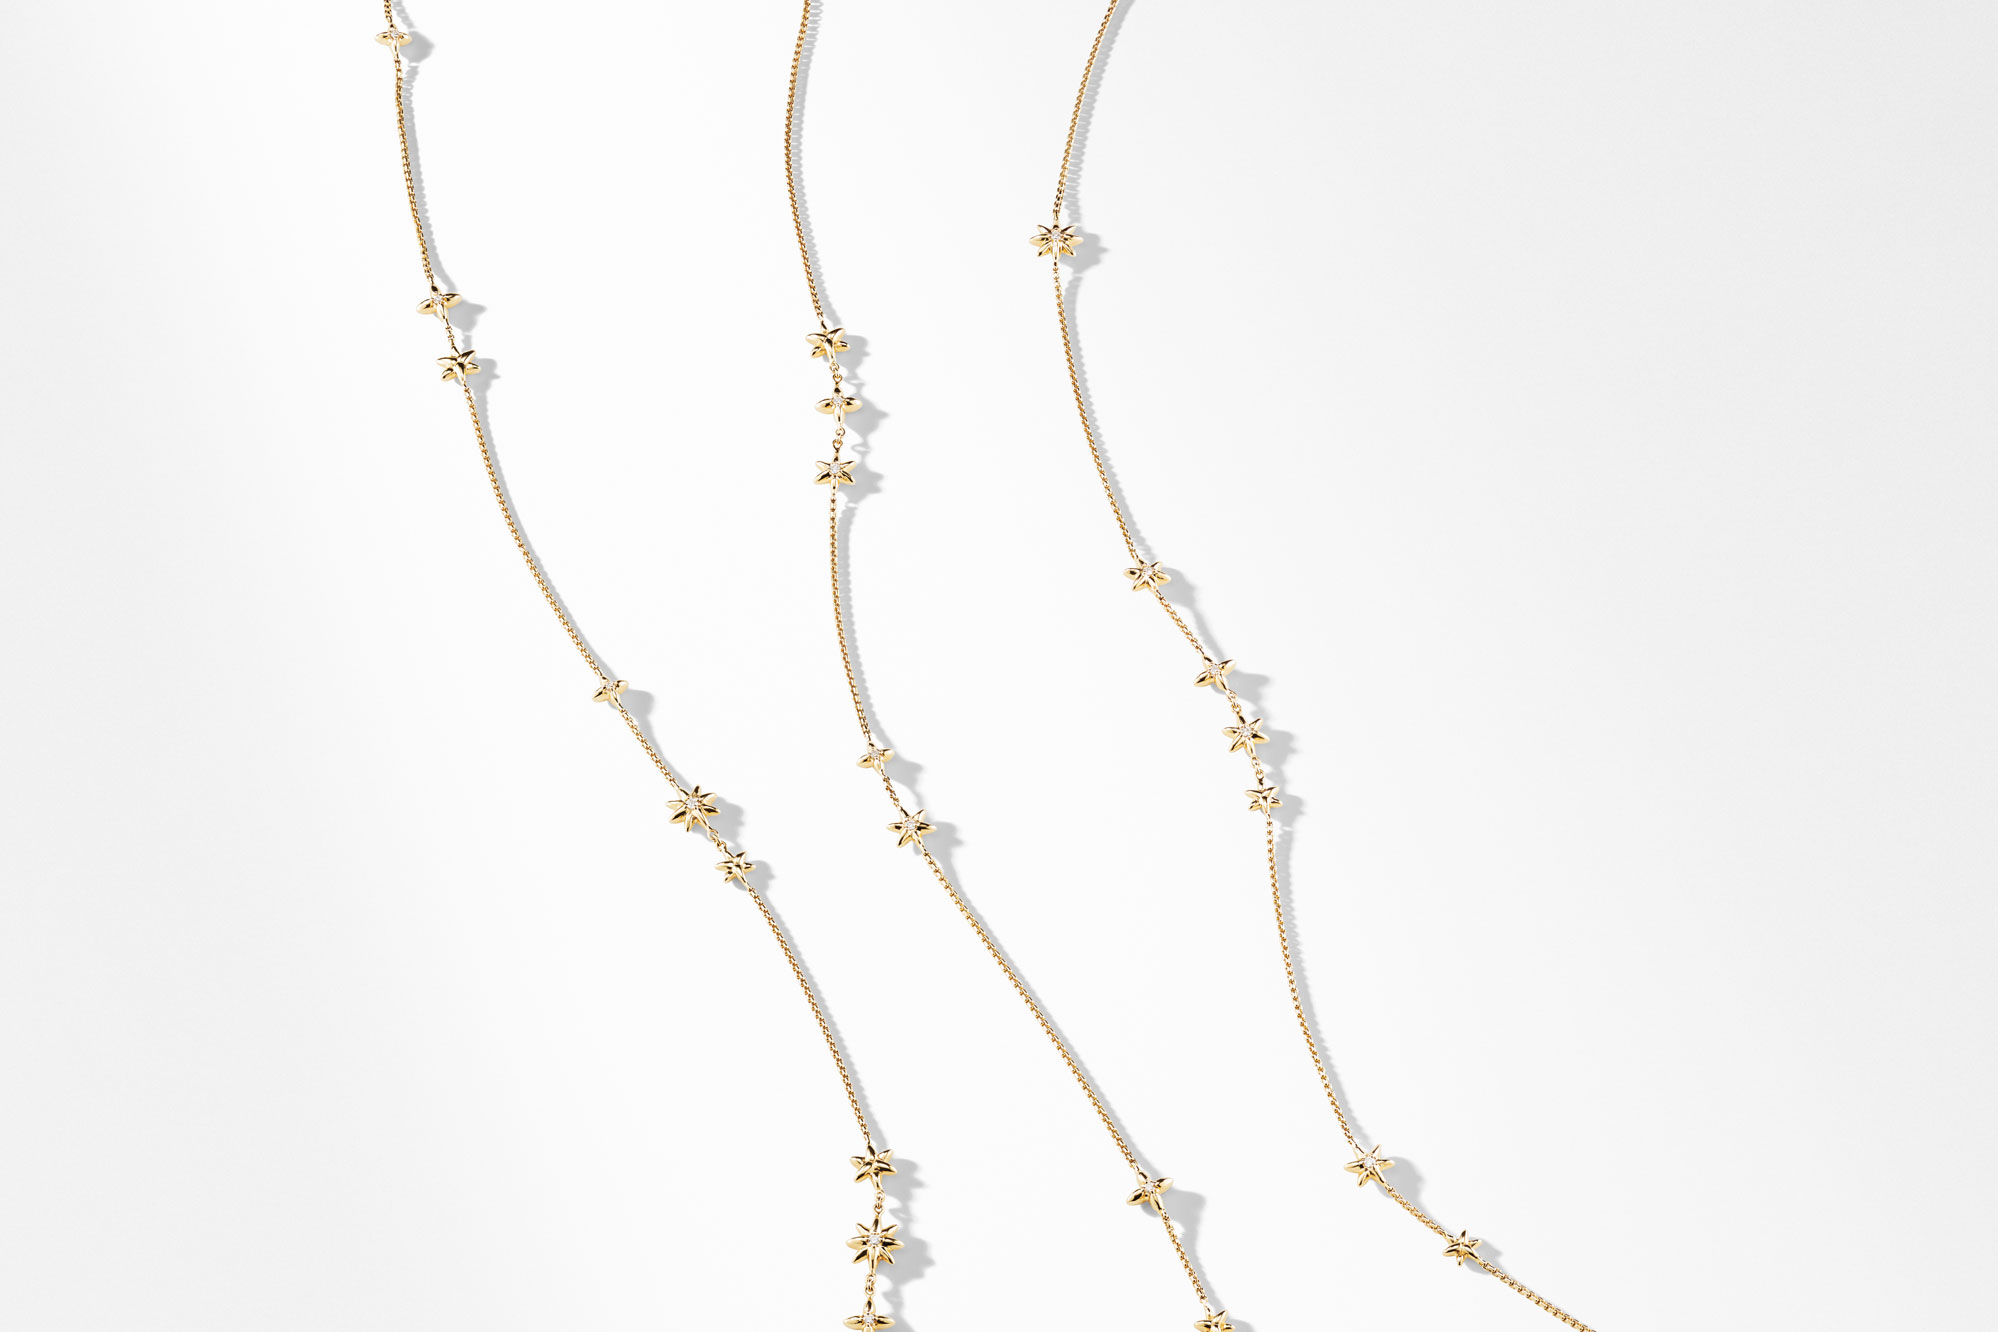 necklace_davidyurman_jewelryphotography.jpg